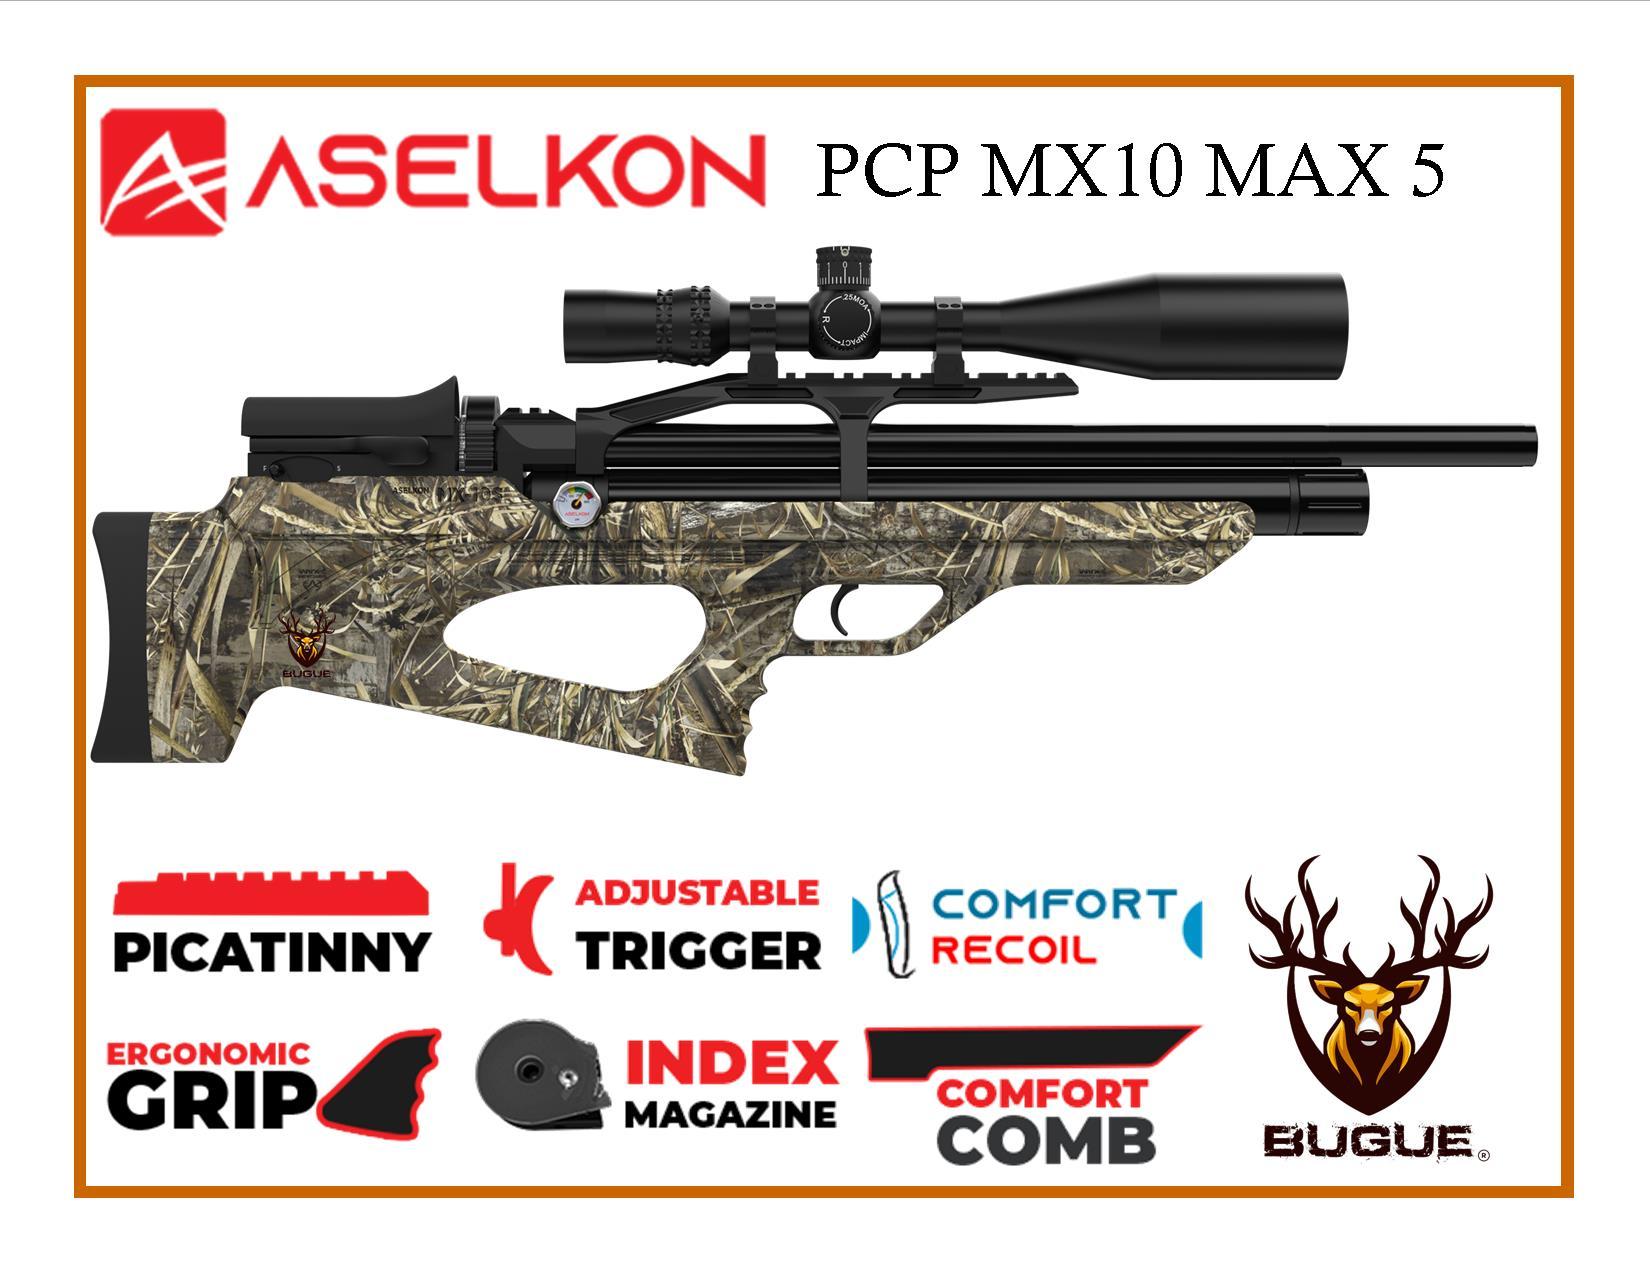 RIFLE PCP ASELKON MX10 MAX 5 CALIBRE 5.5 MM